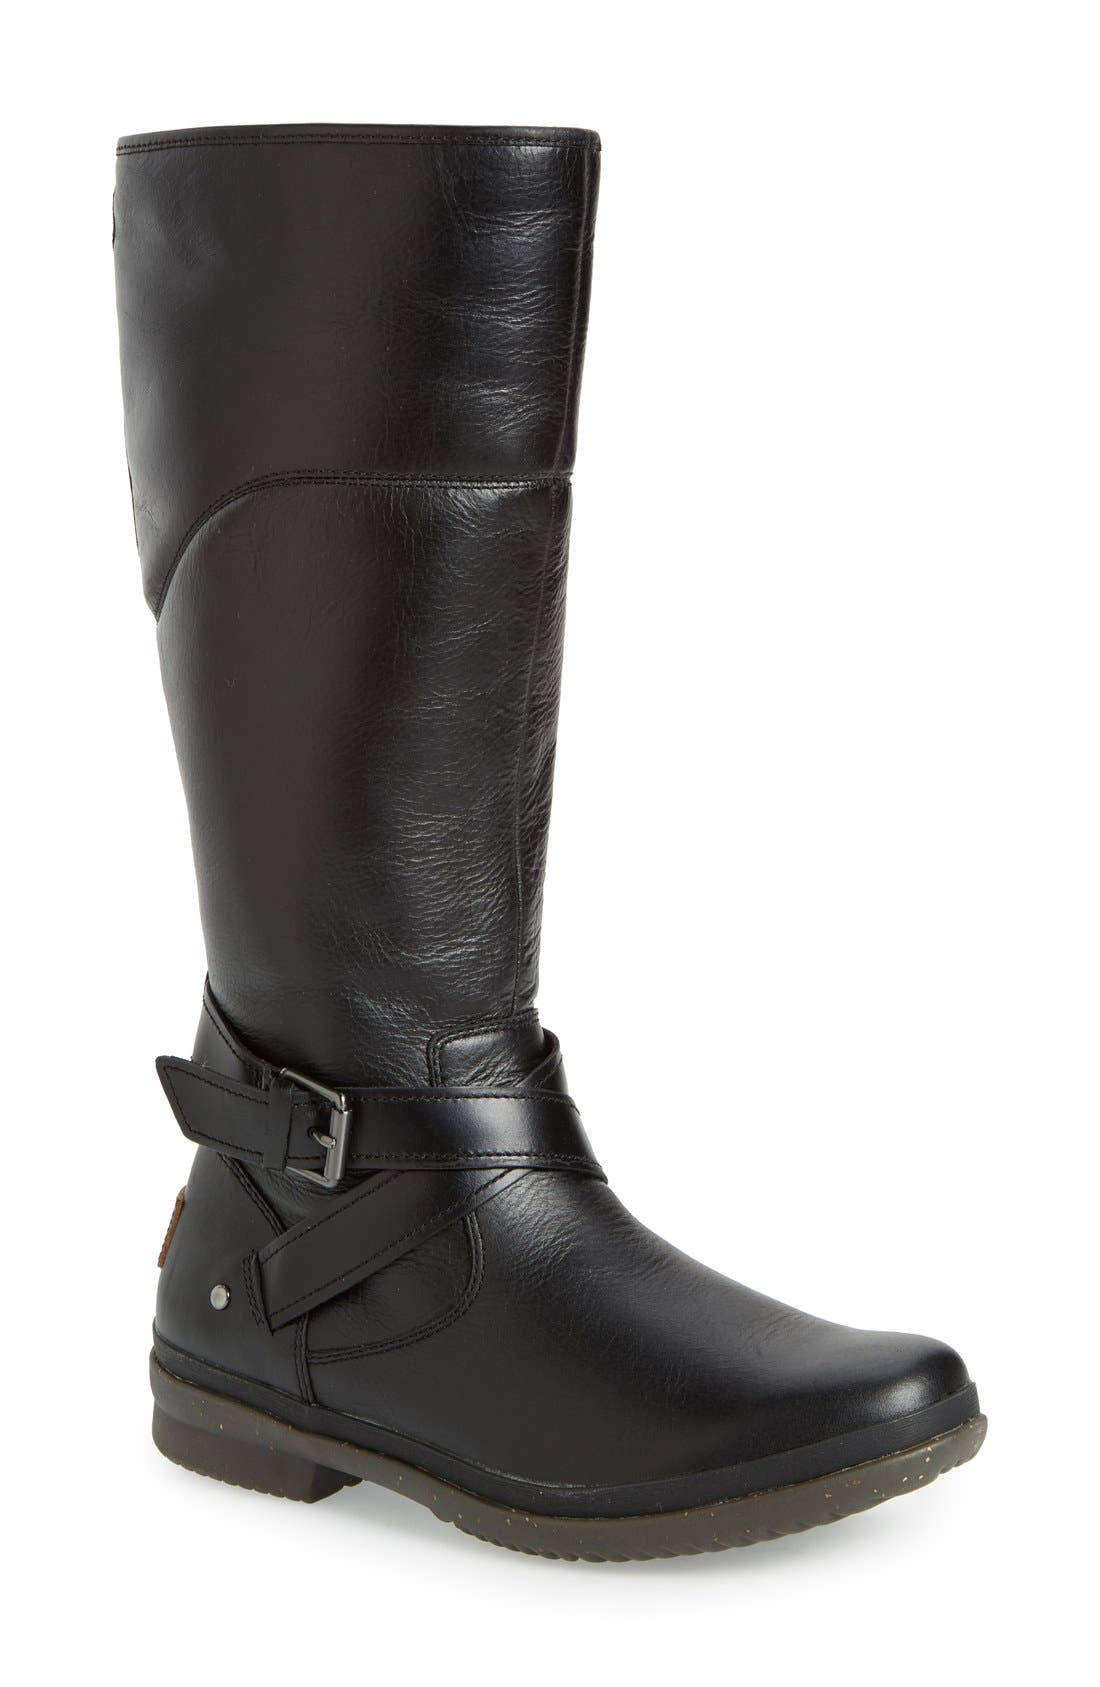 Main Image - UGG® Evanna Riding Boot (Women)